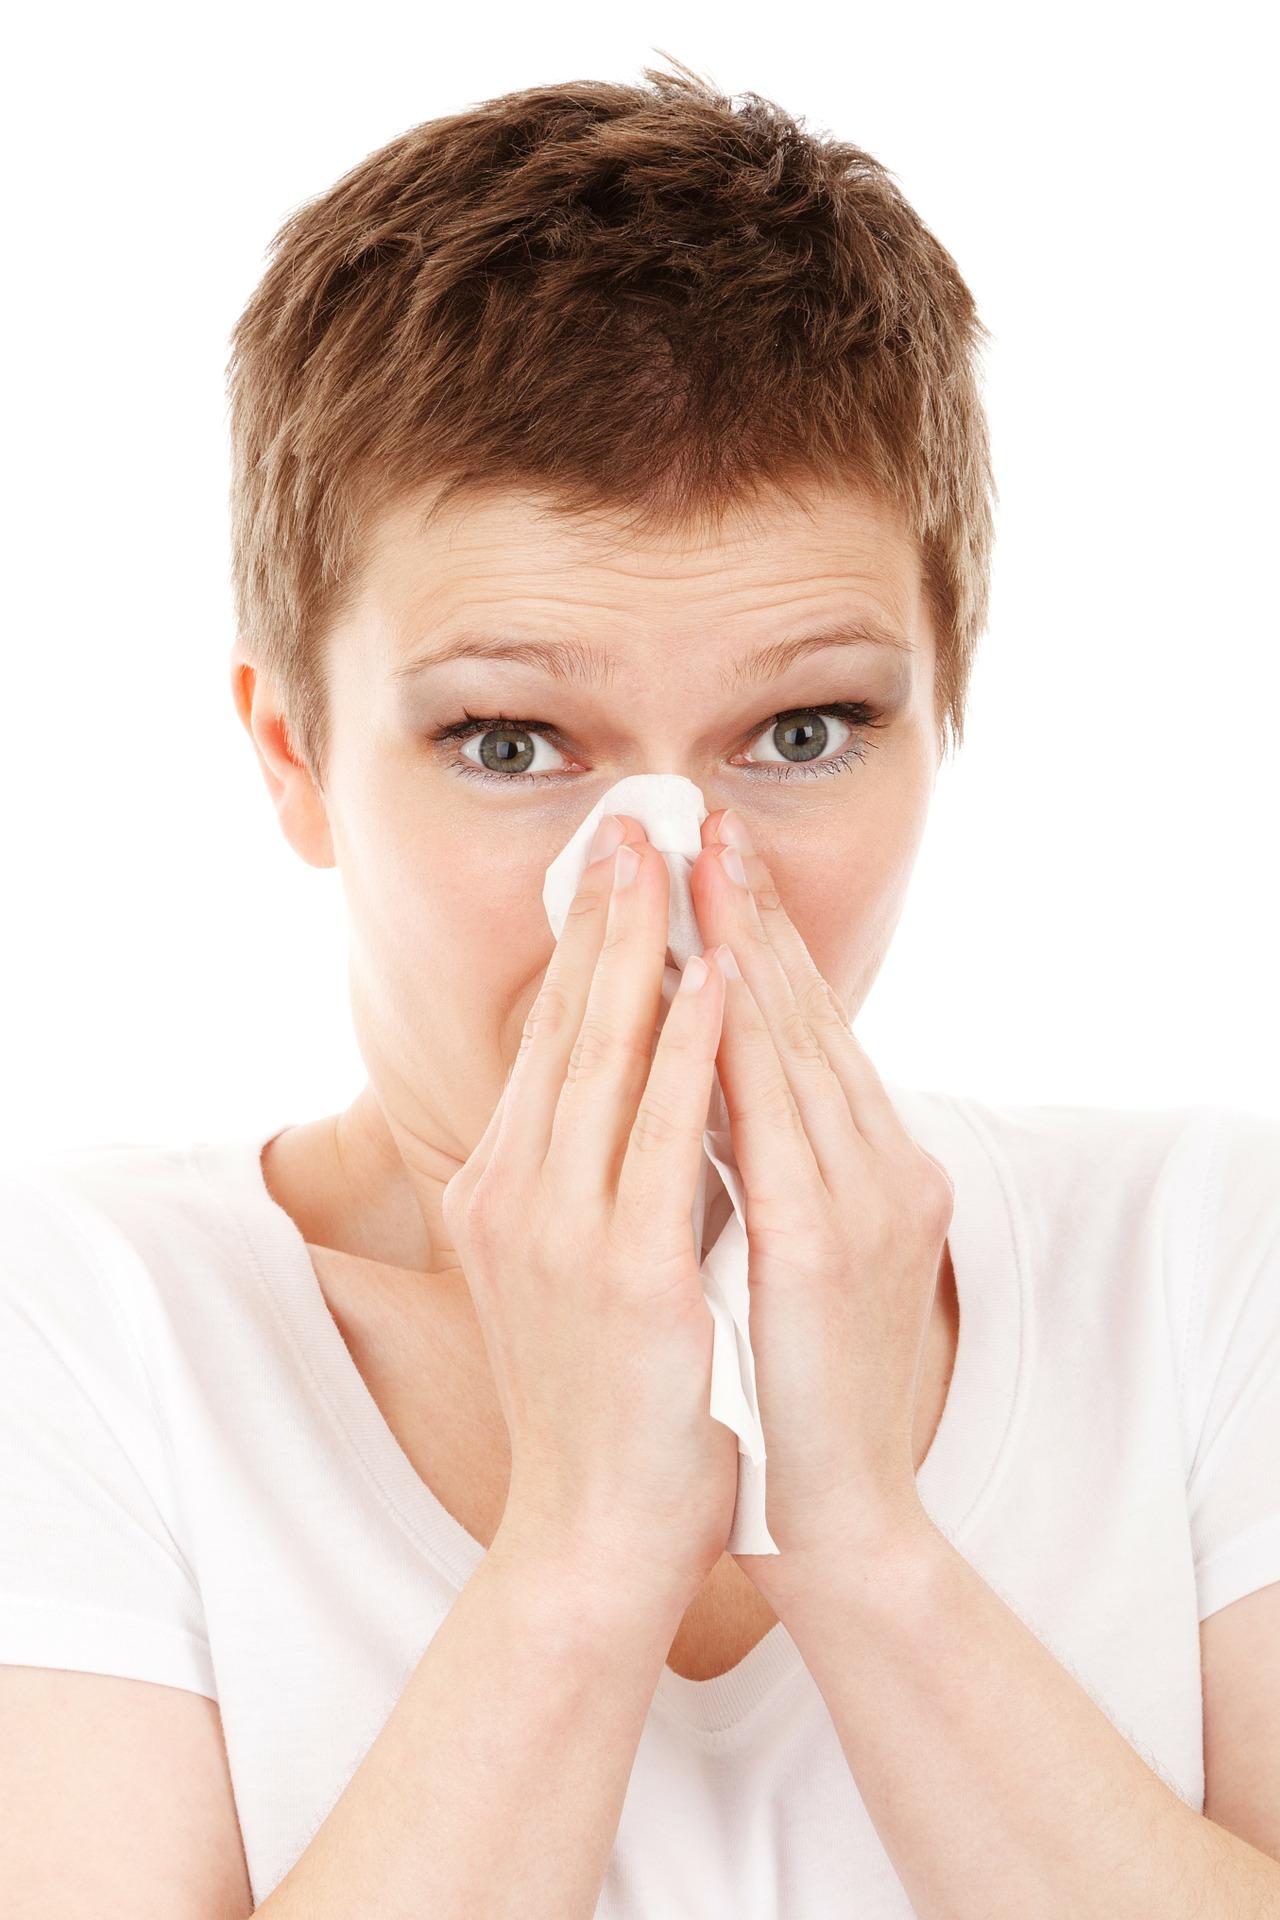 allergy sufferer, allergies, seasonal allergies, benefits of double pane windows